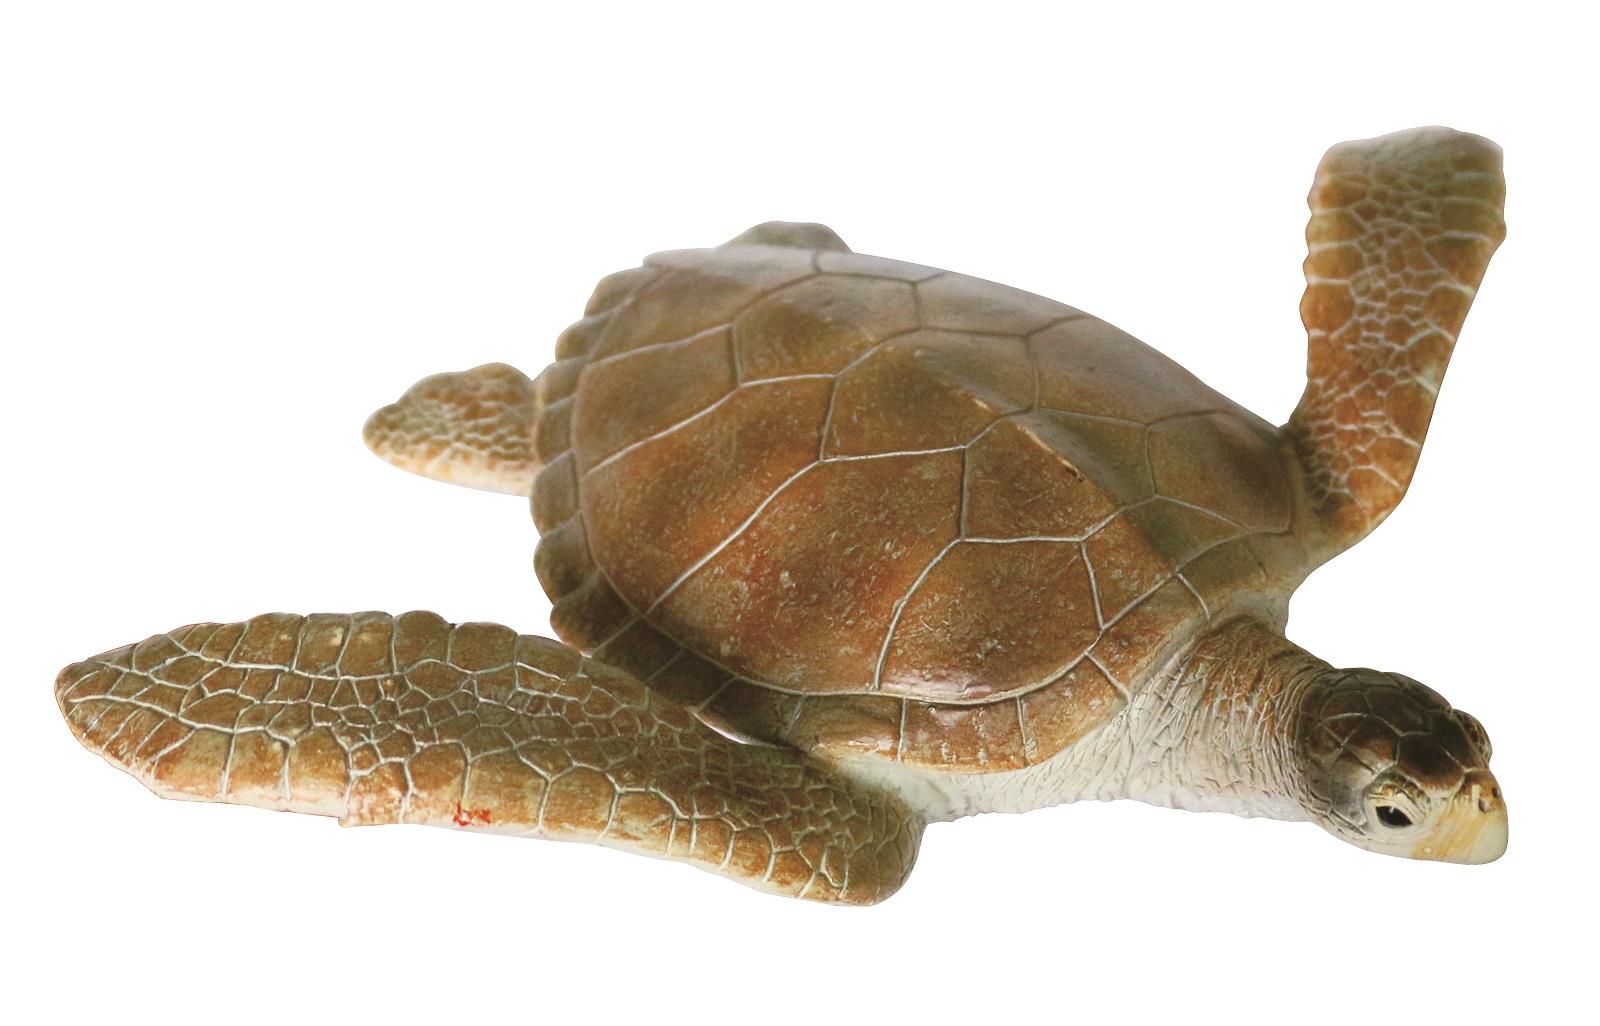 Фигурка АБВГДЕЙКА Фигурка Черепаха, 24 см, RW0013